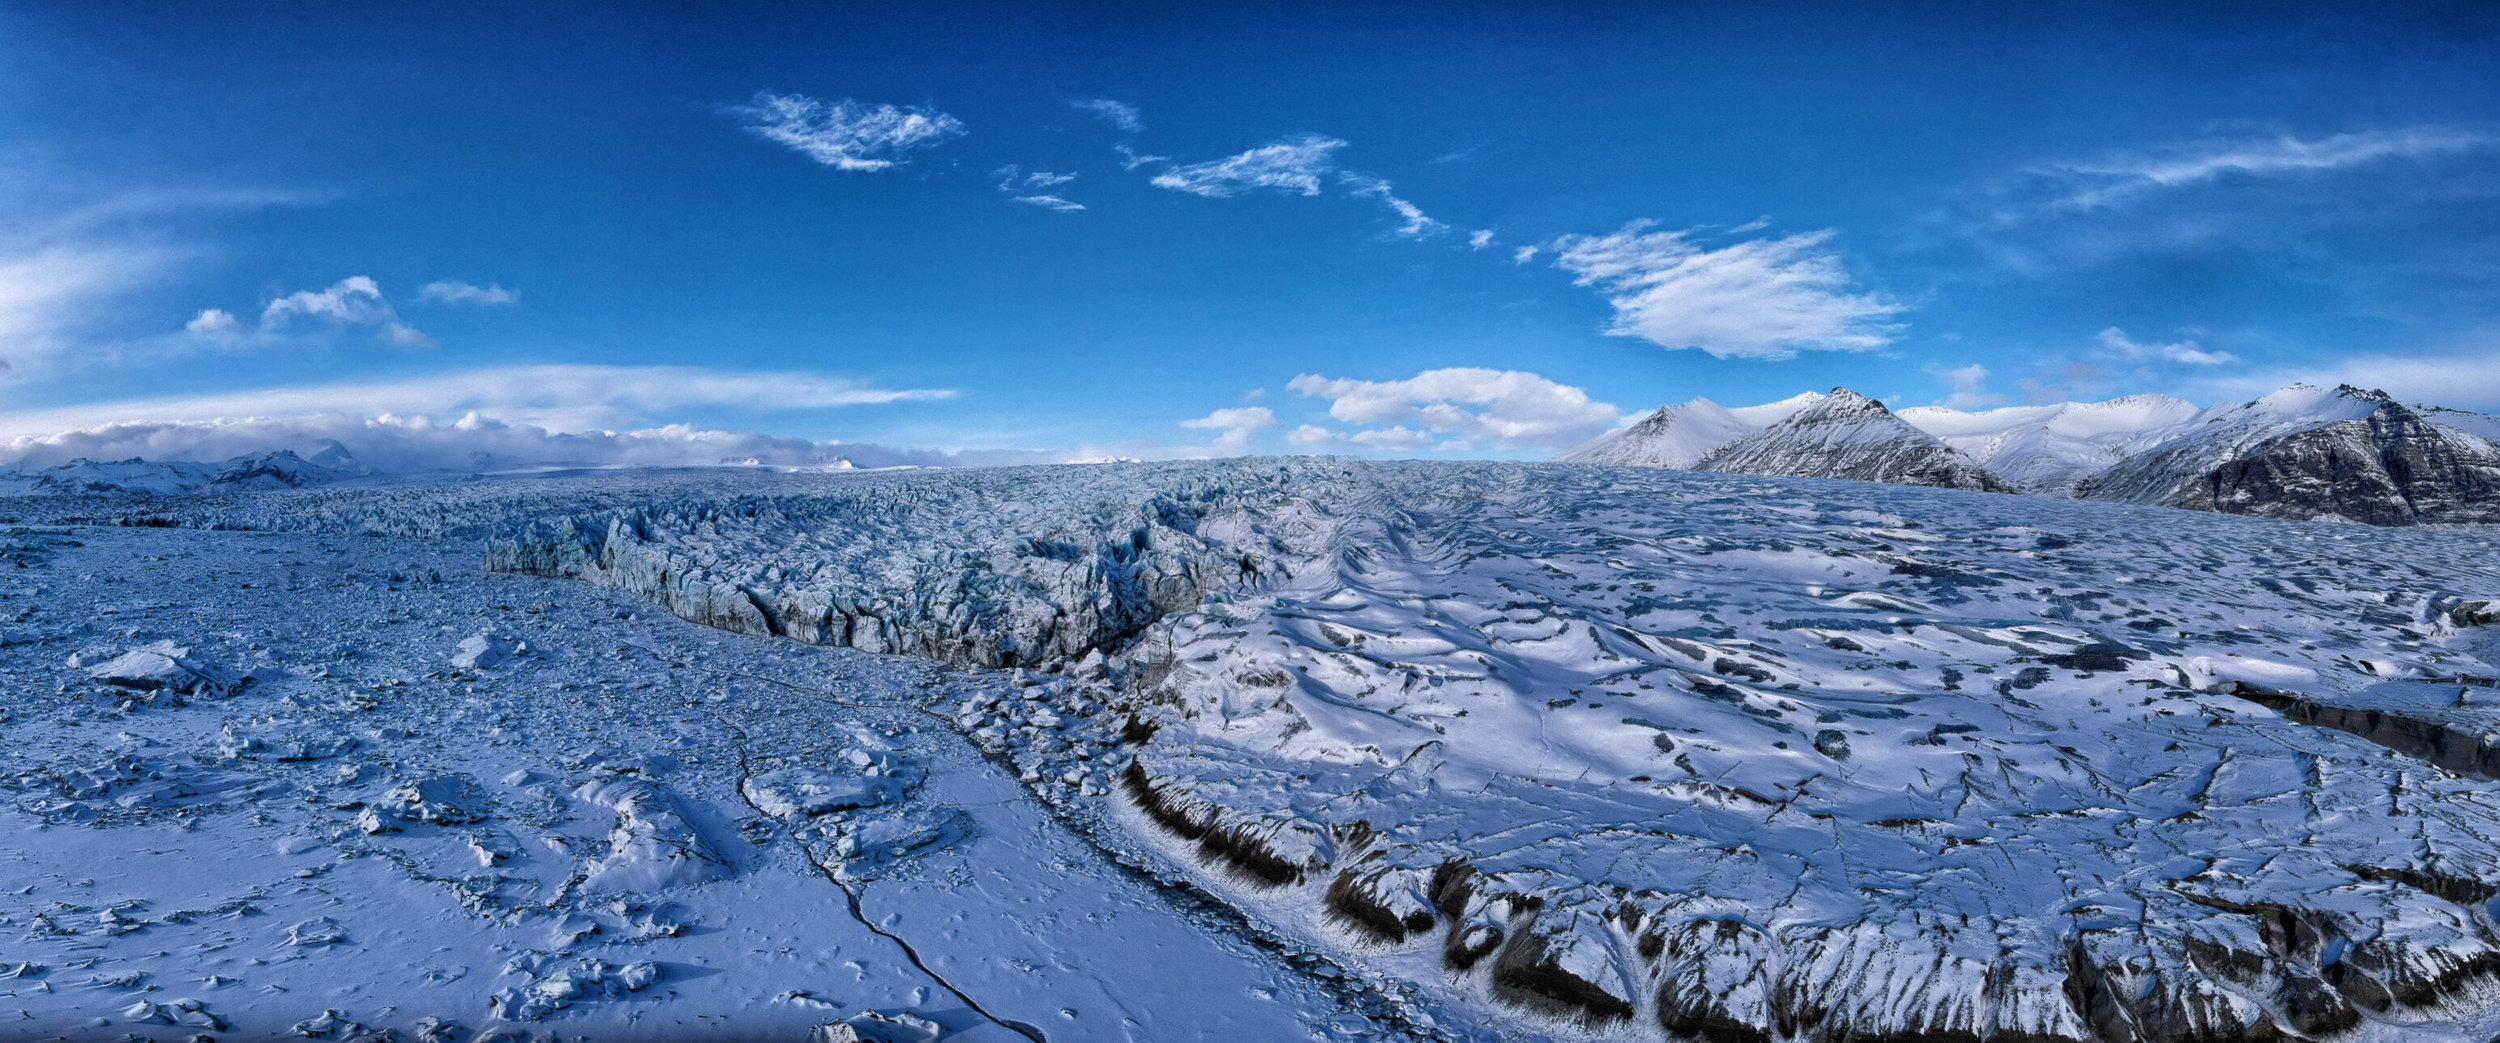 Iceland 2018 - Drone Pano--7.jpg